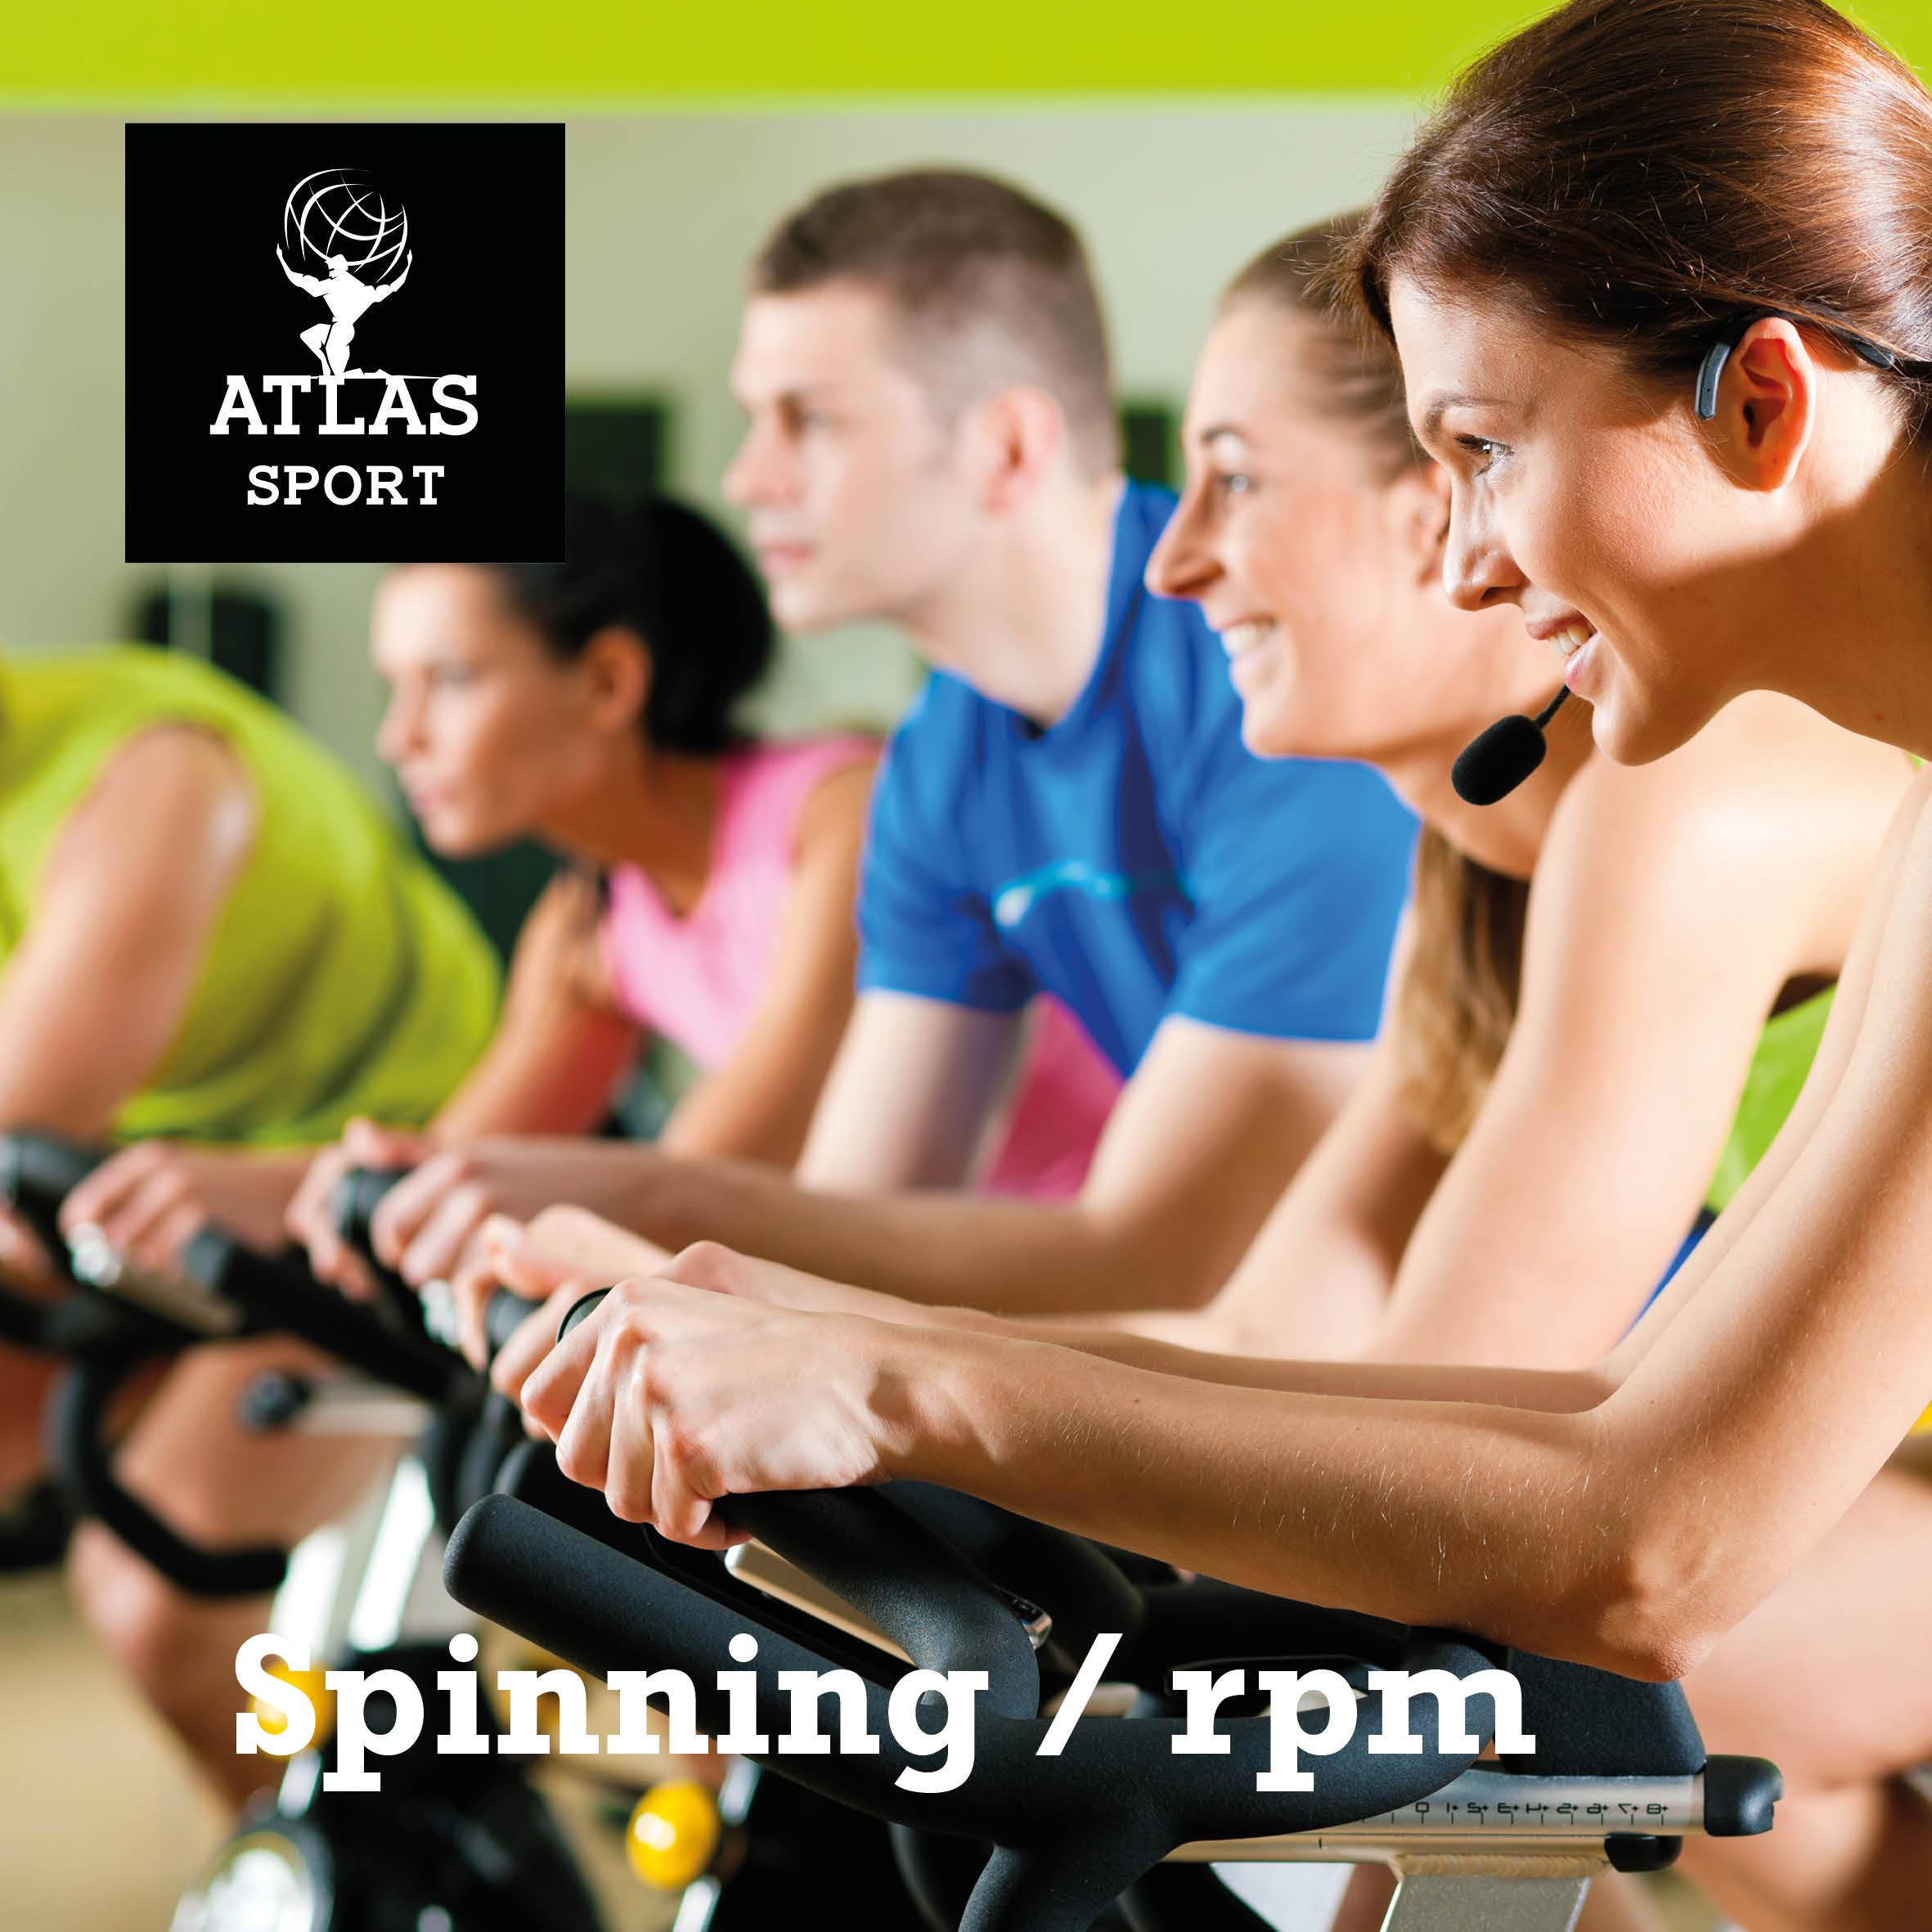 Spinning - rpm